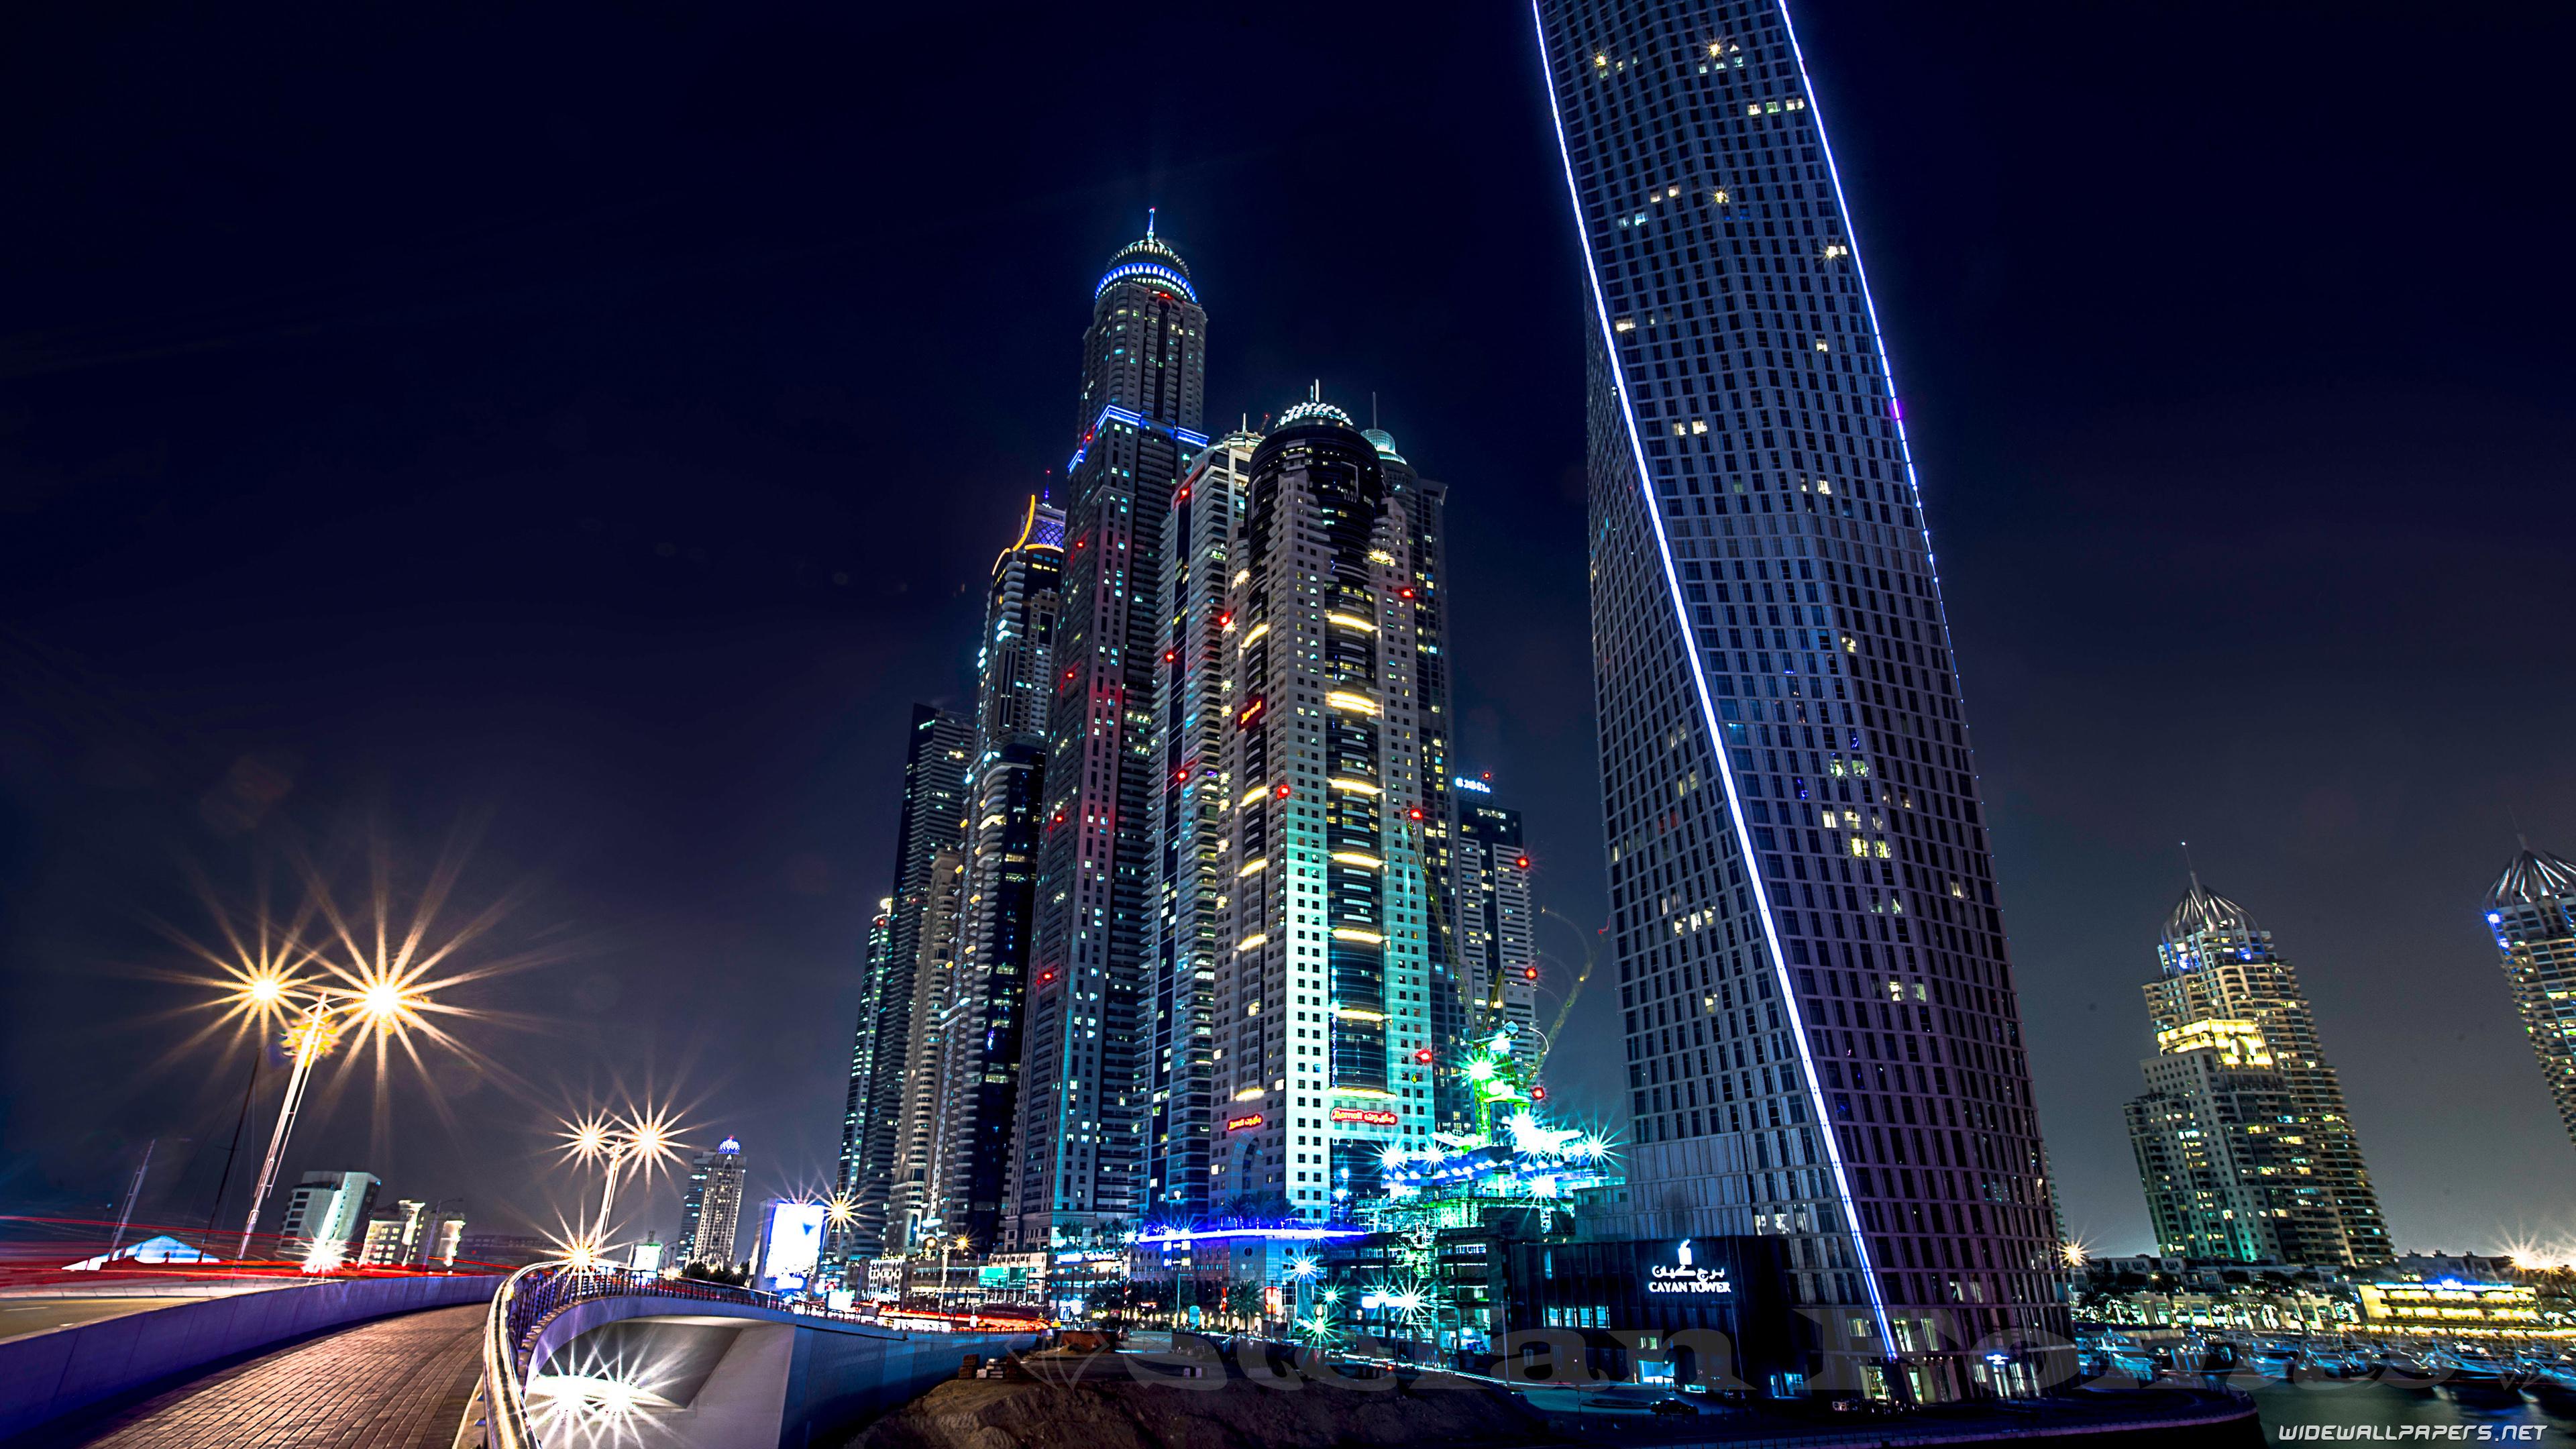 Px Dubai 92068 Hd Wallpaper Backgrounds Download